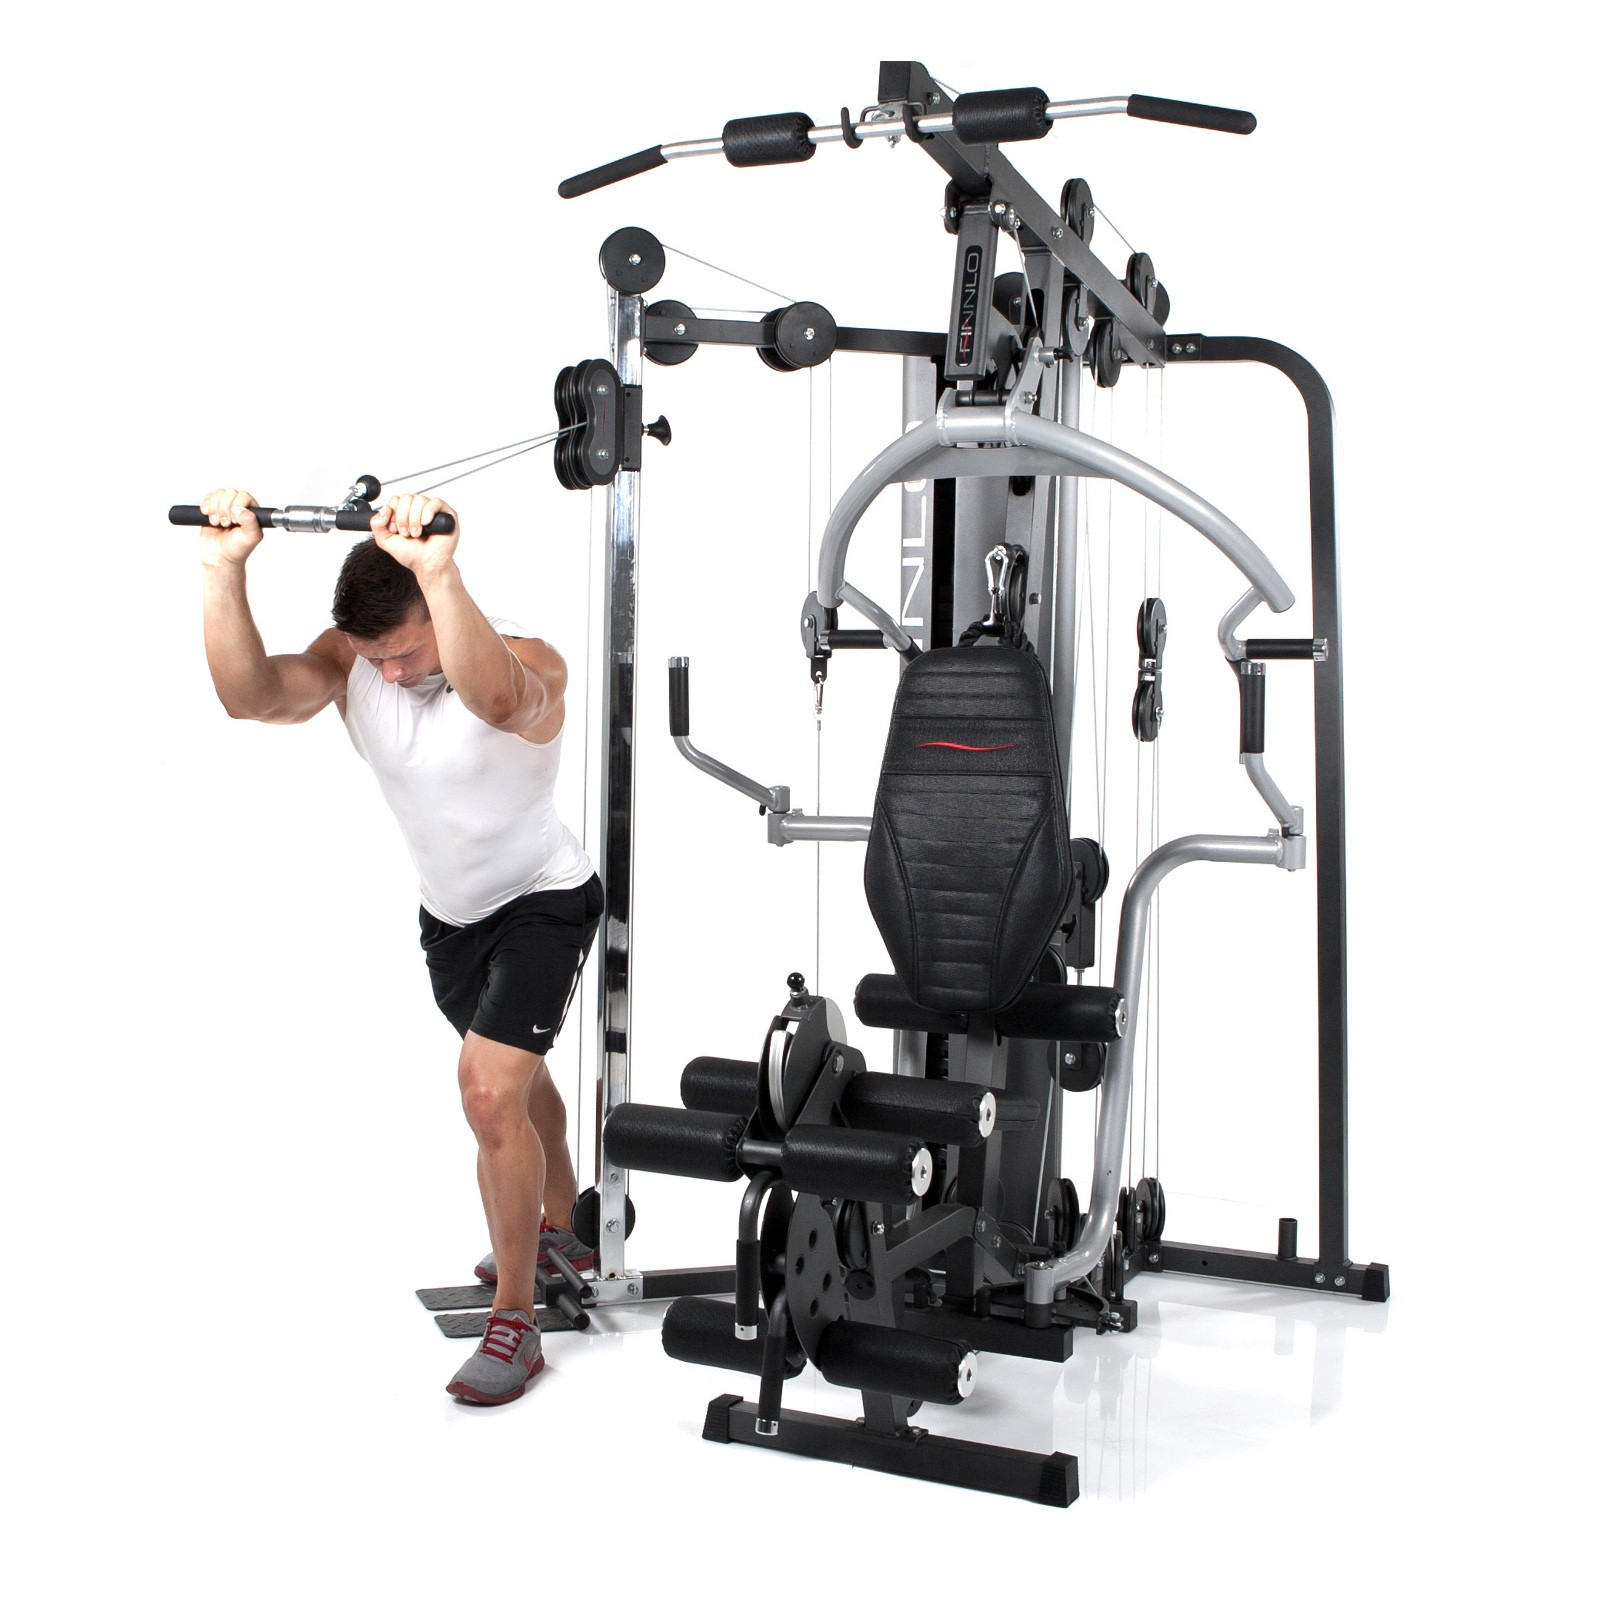 Finnlo Multi Gym Autark 6000 Buy With 11 Customer Ratings